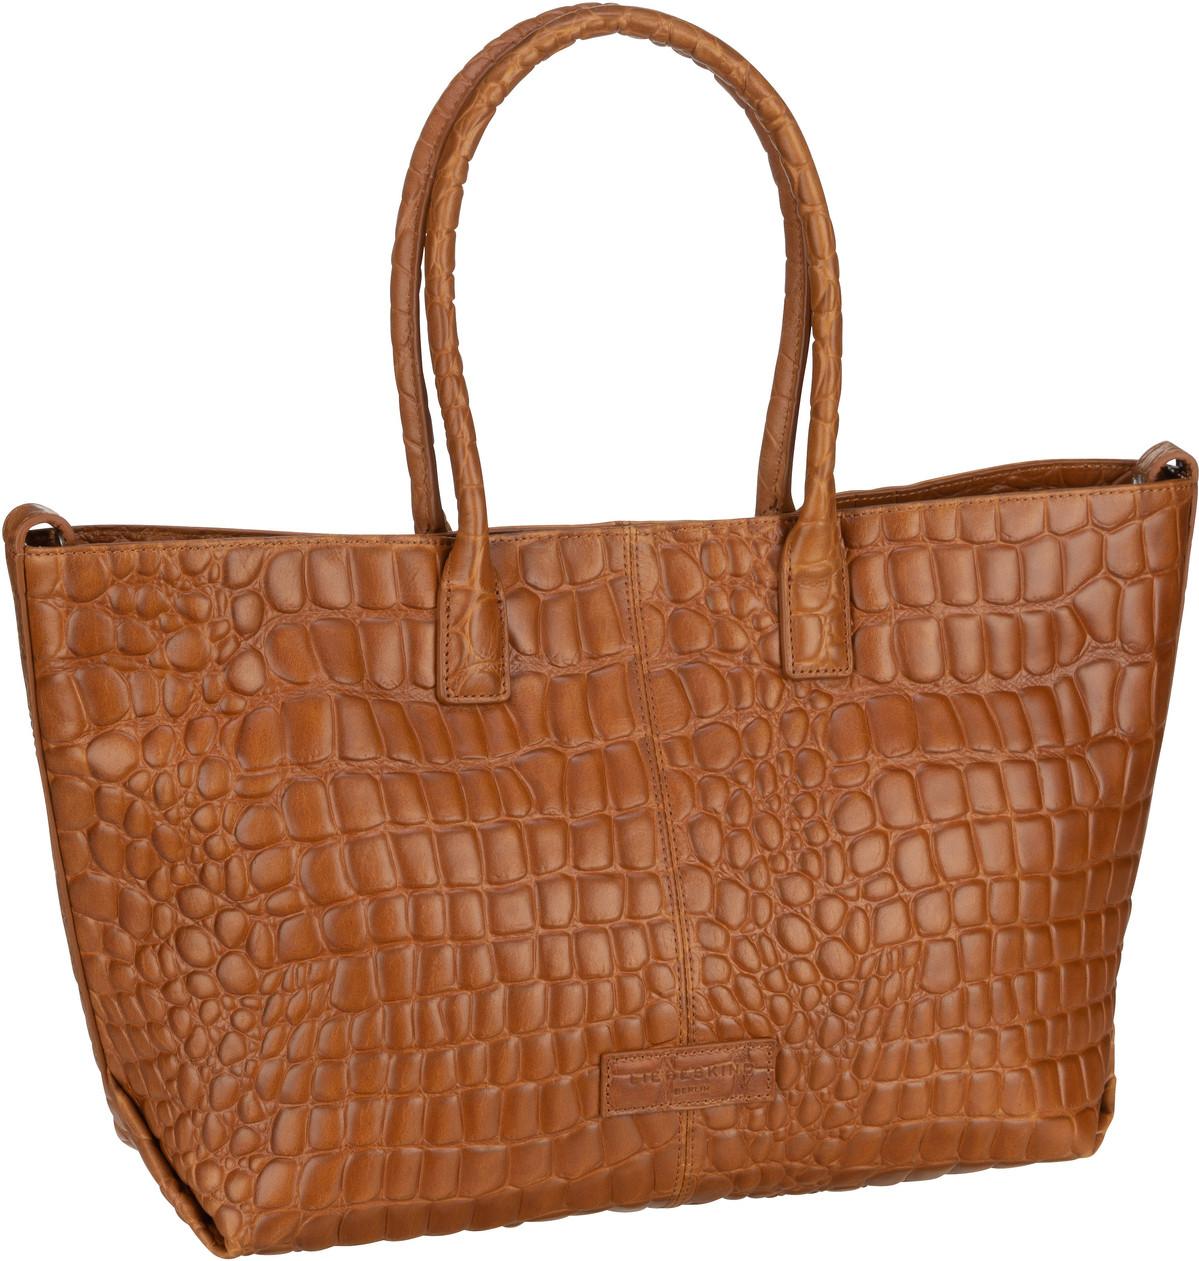 Berlin Handtasche Malibu 2 Chelsea Shopper M Croco Golden Amber